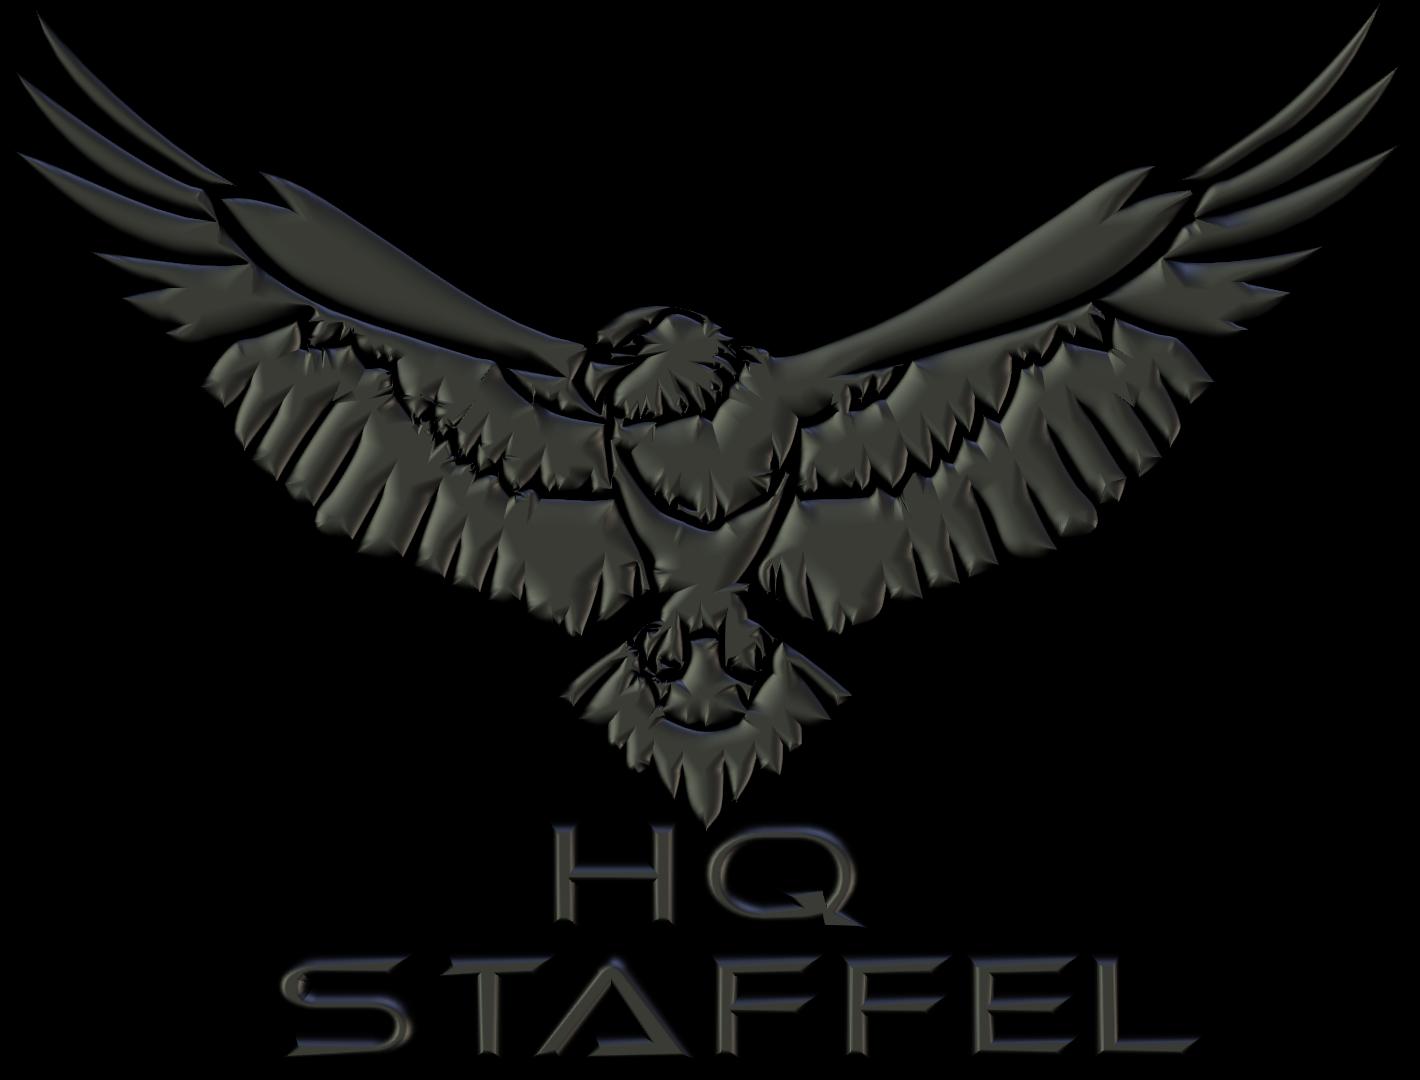 HQ-Staffel-Logo_Adler_02_Plastik_schwarz_matt_01.png